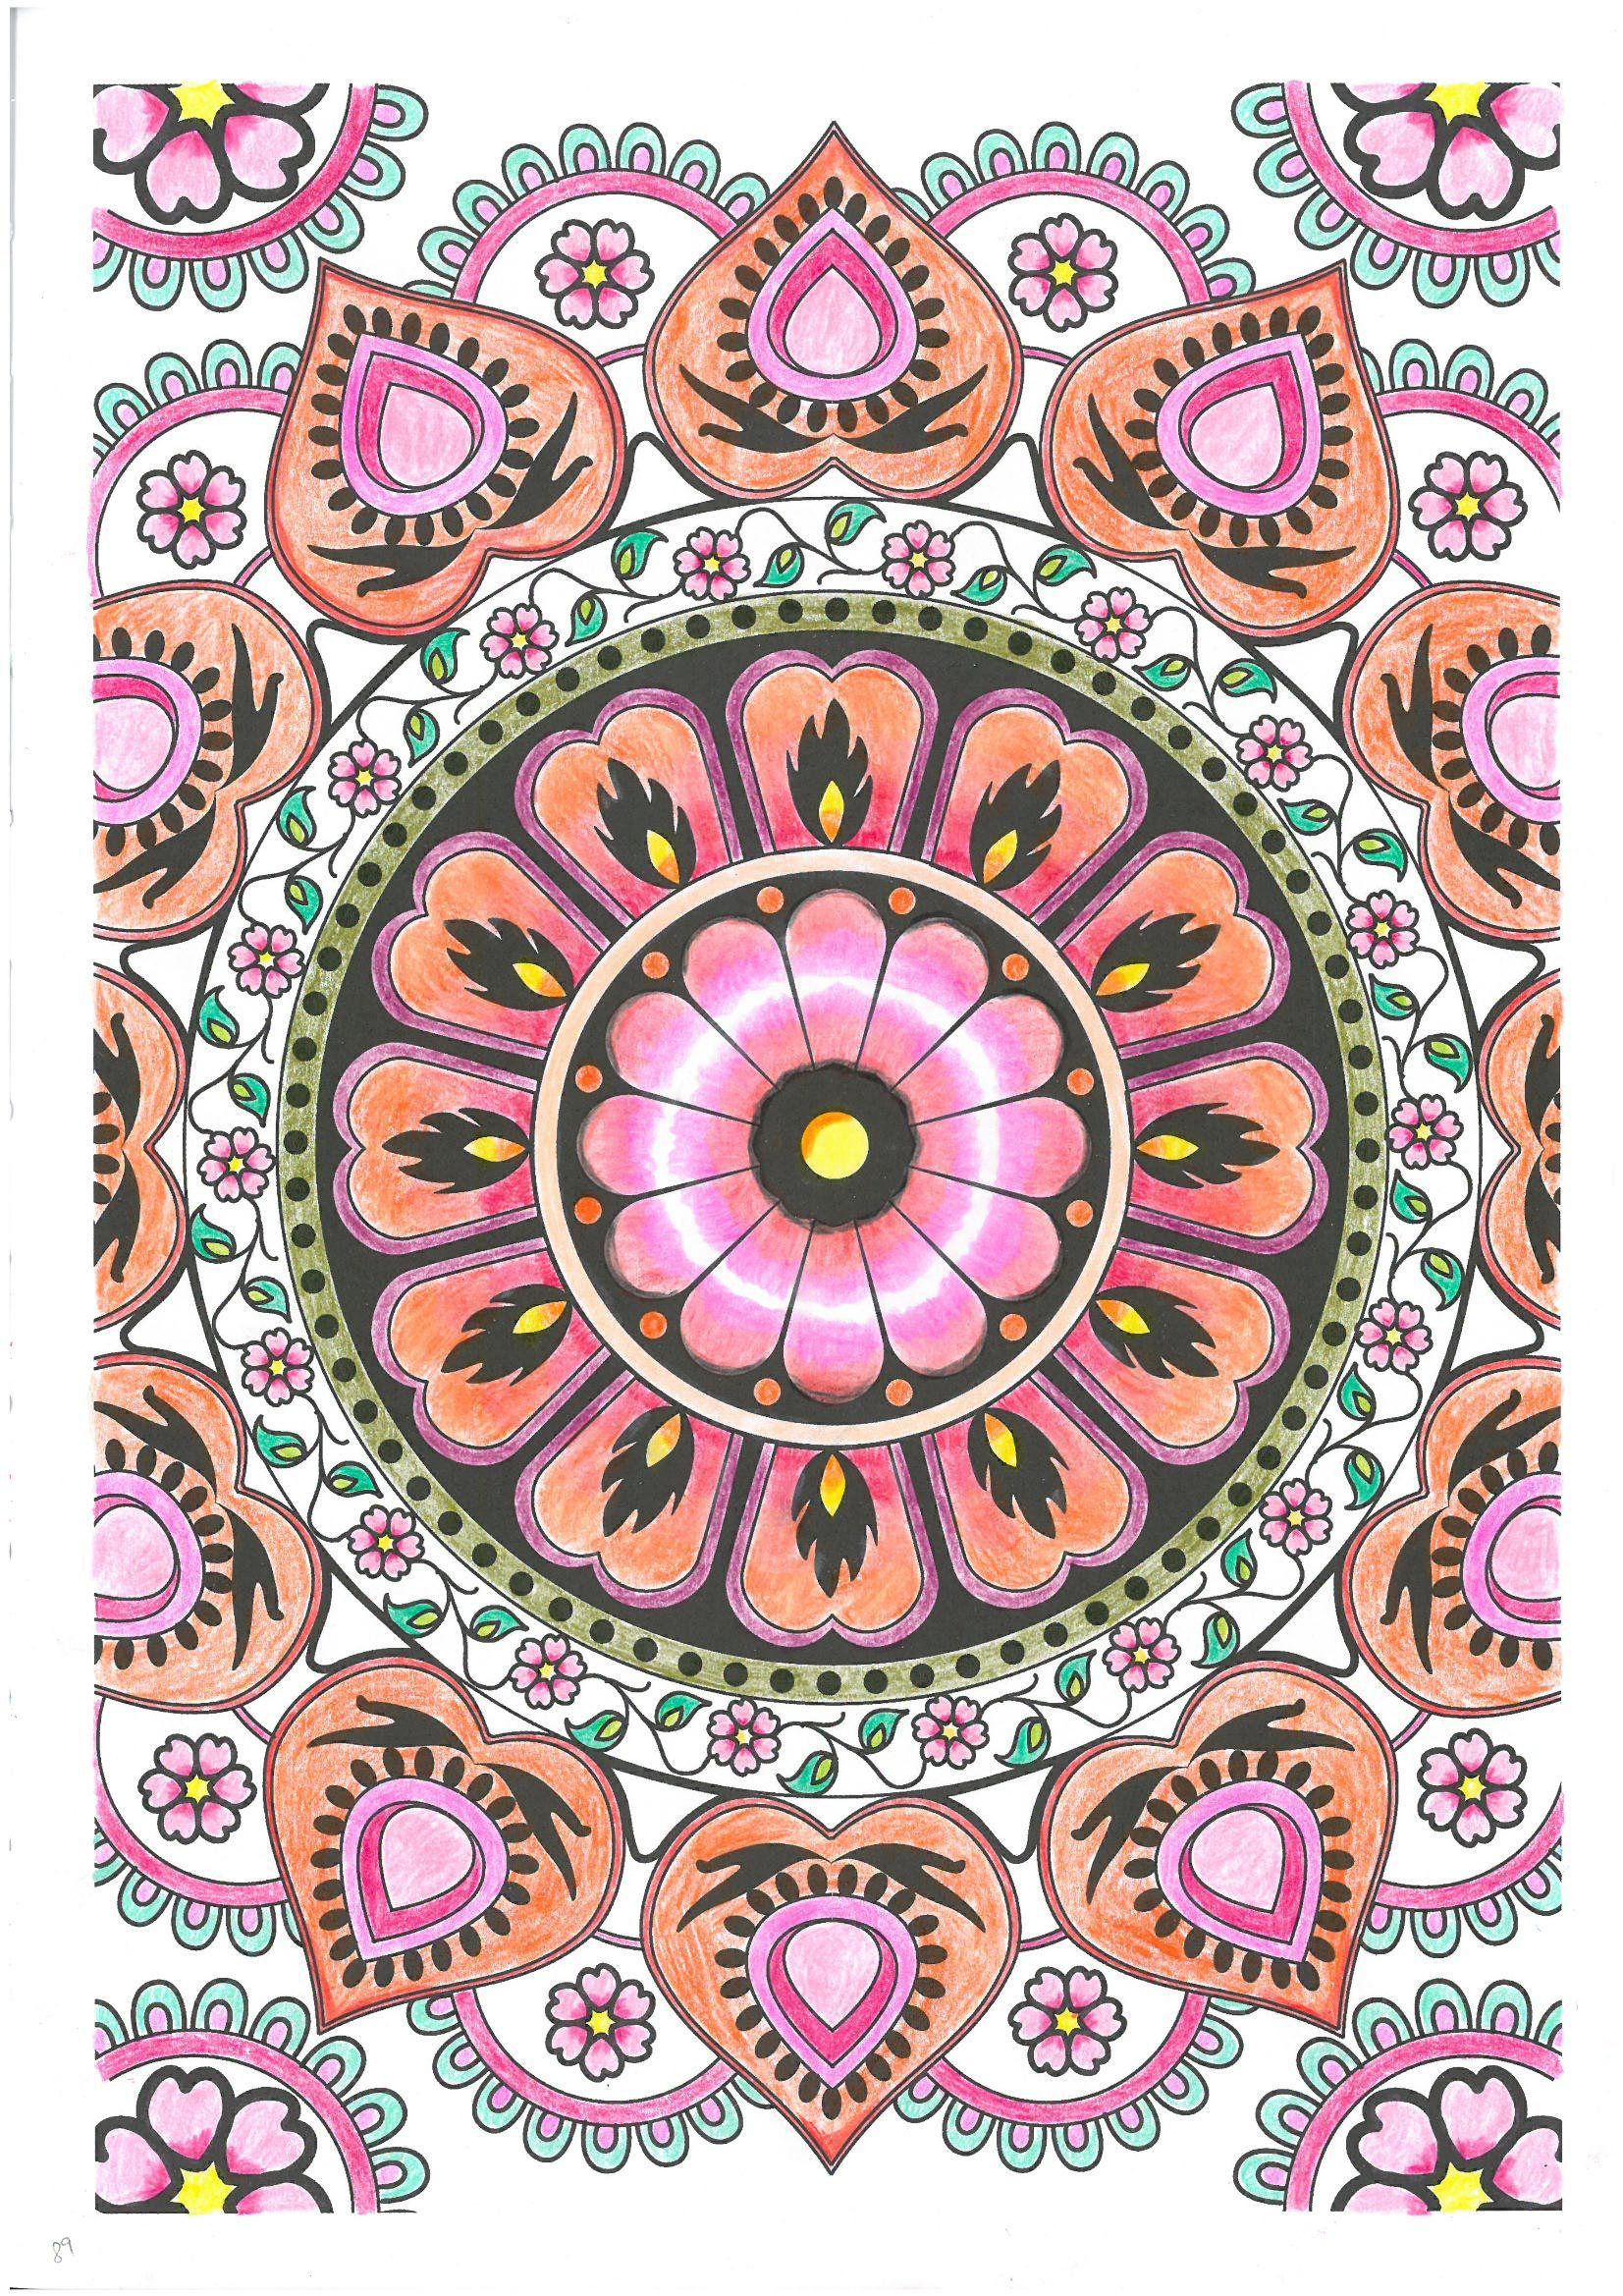 Pag 89 colorir arte terapia mandalas pintado a lpis Art